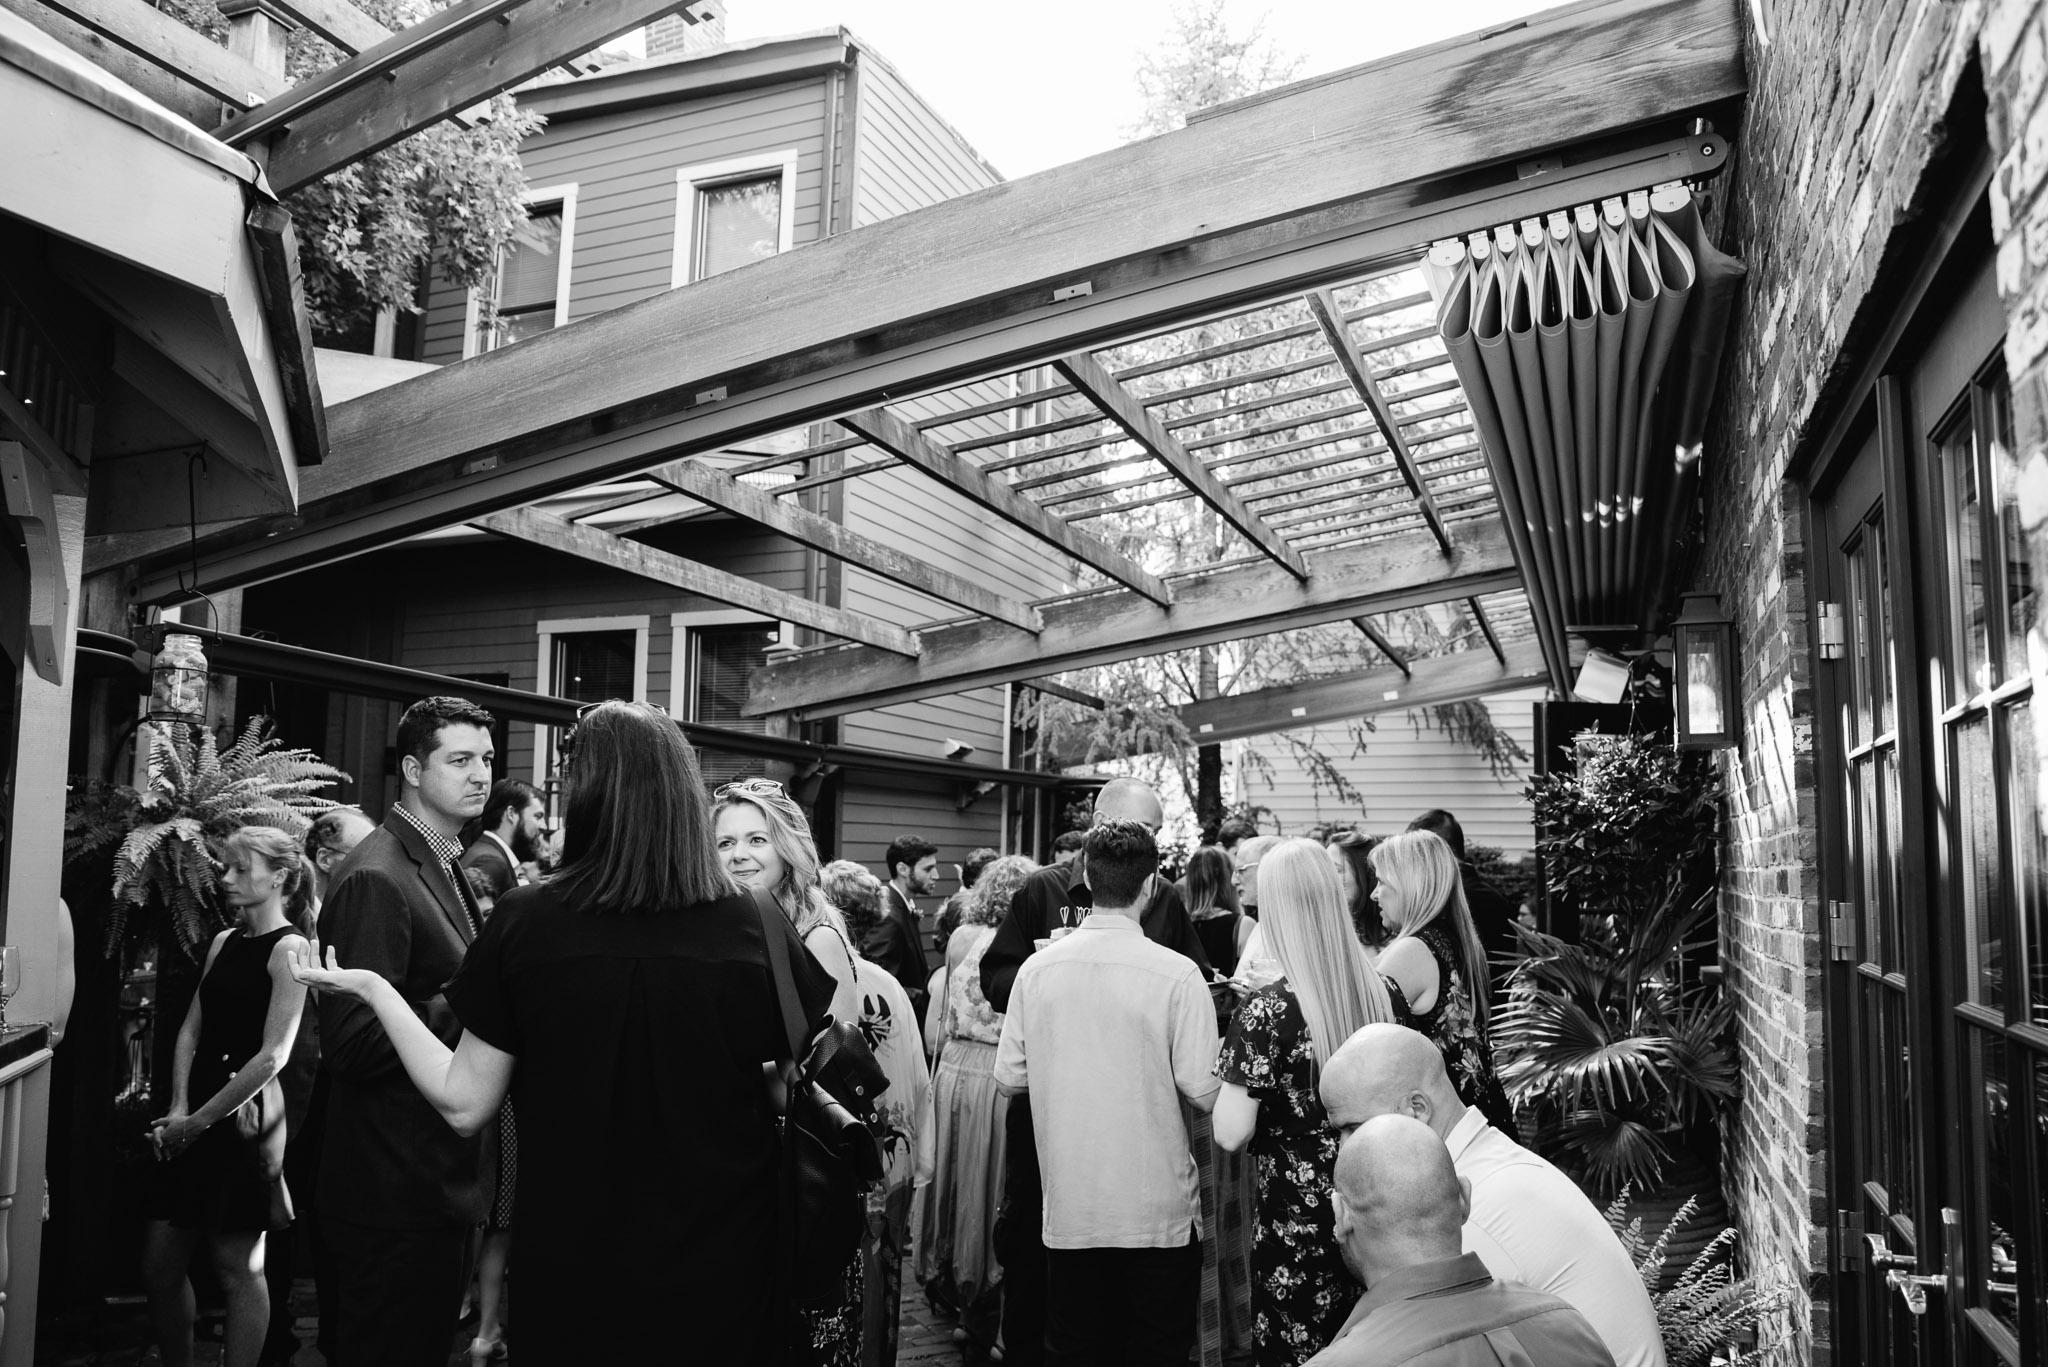 Morning Glory Inn weddings, Pittsburgh Wedding photography, Pittsburgh wedding photographer, Mariah Fisher-8839.jpg